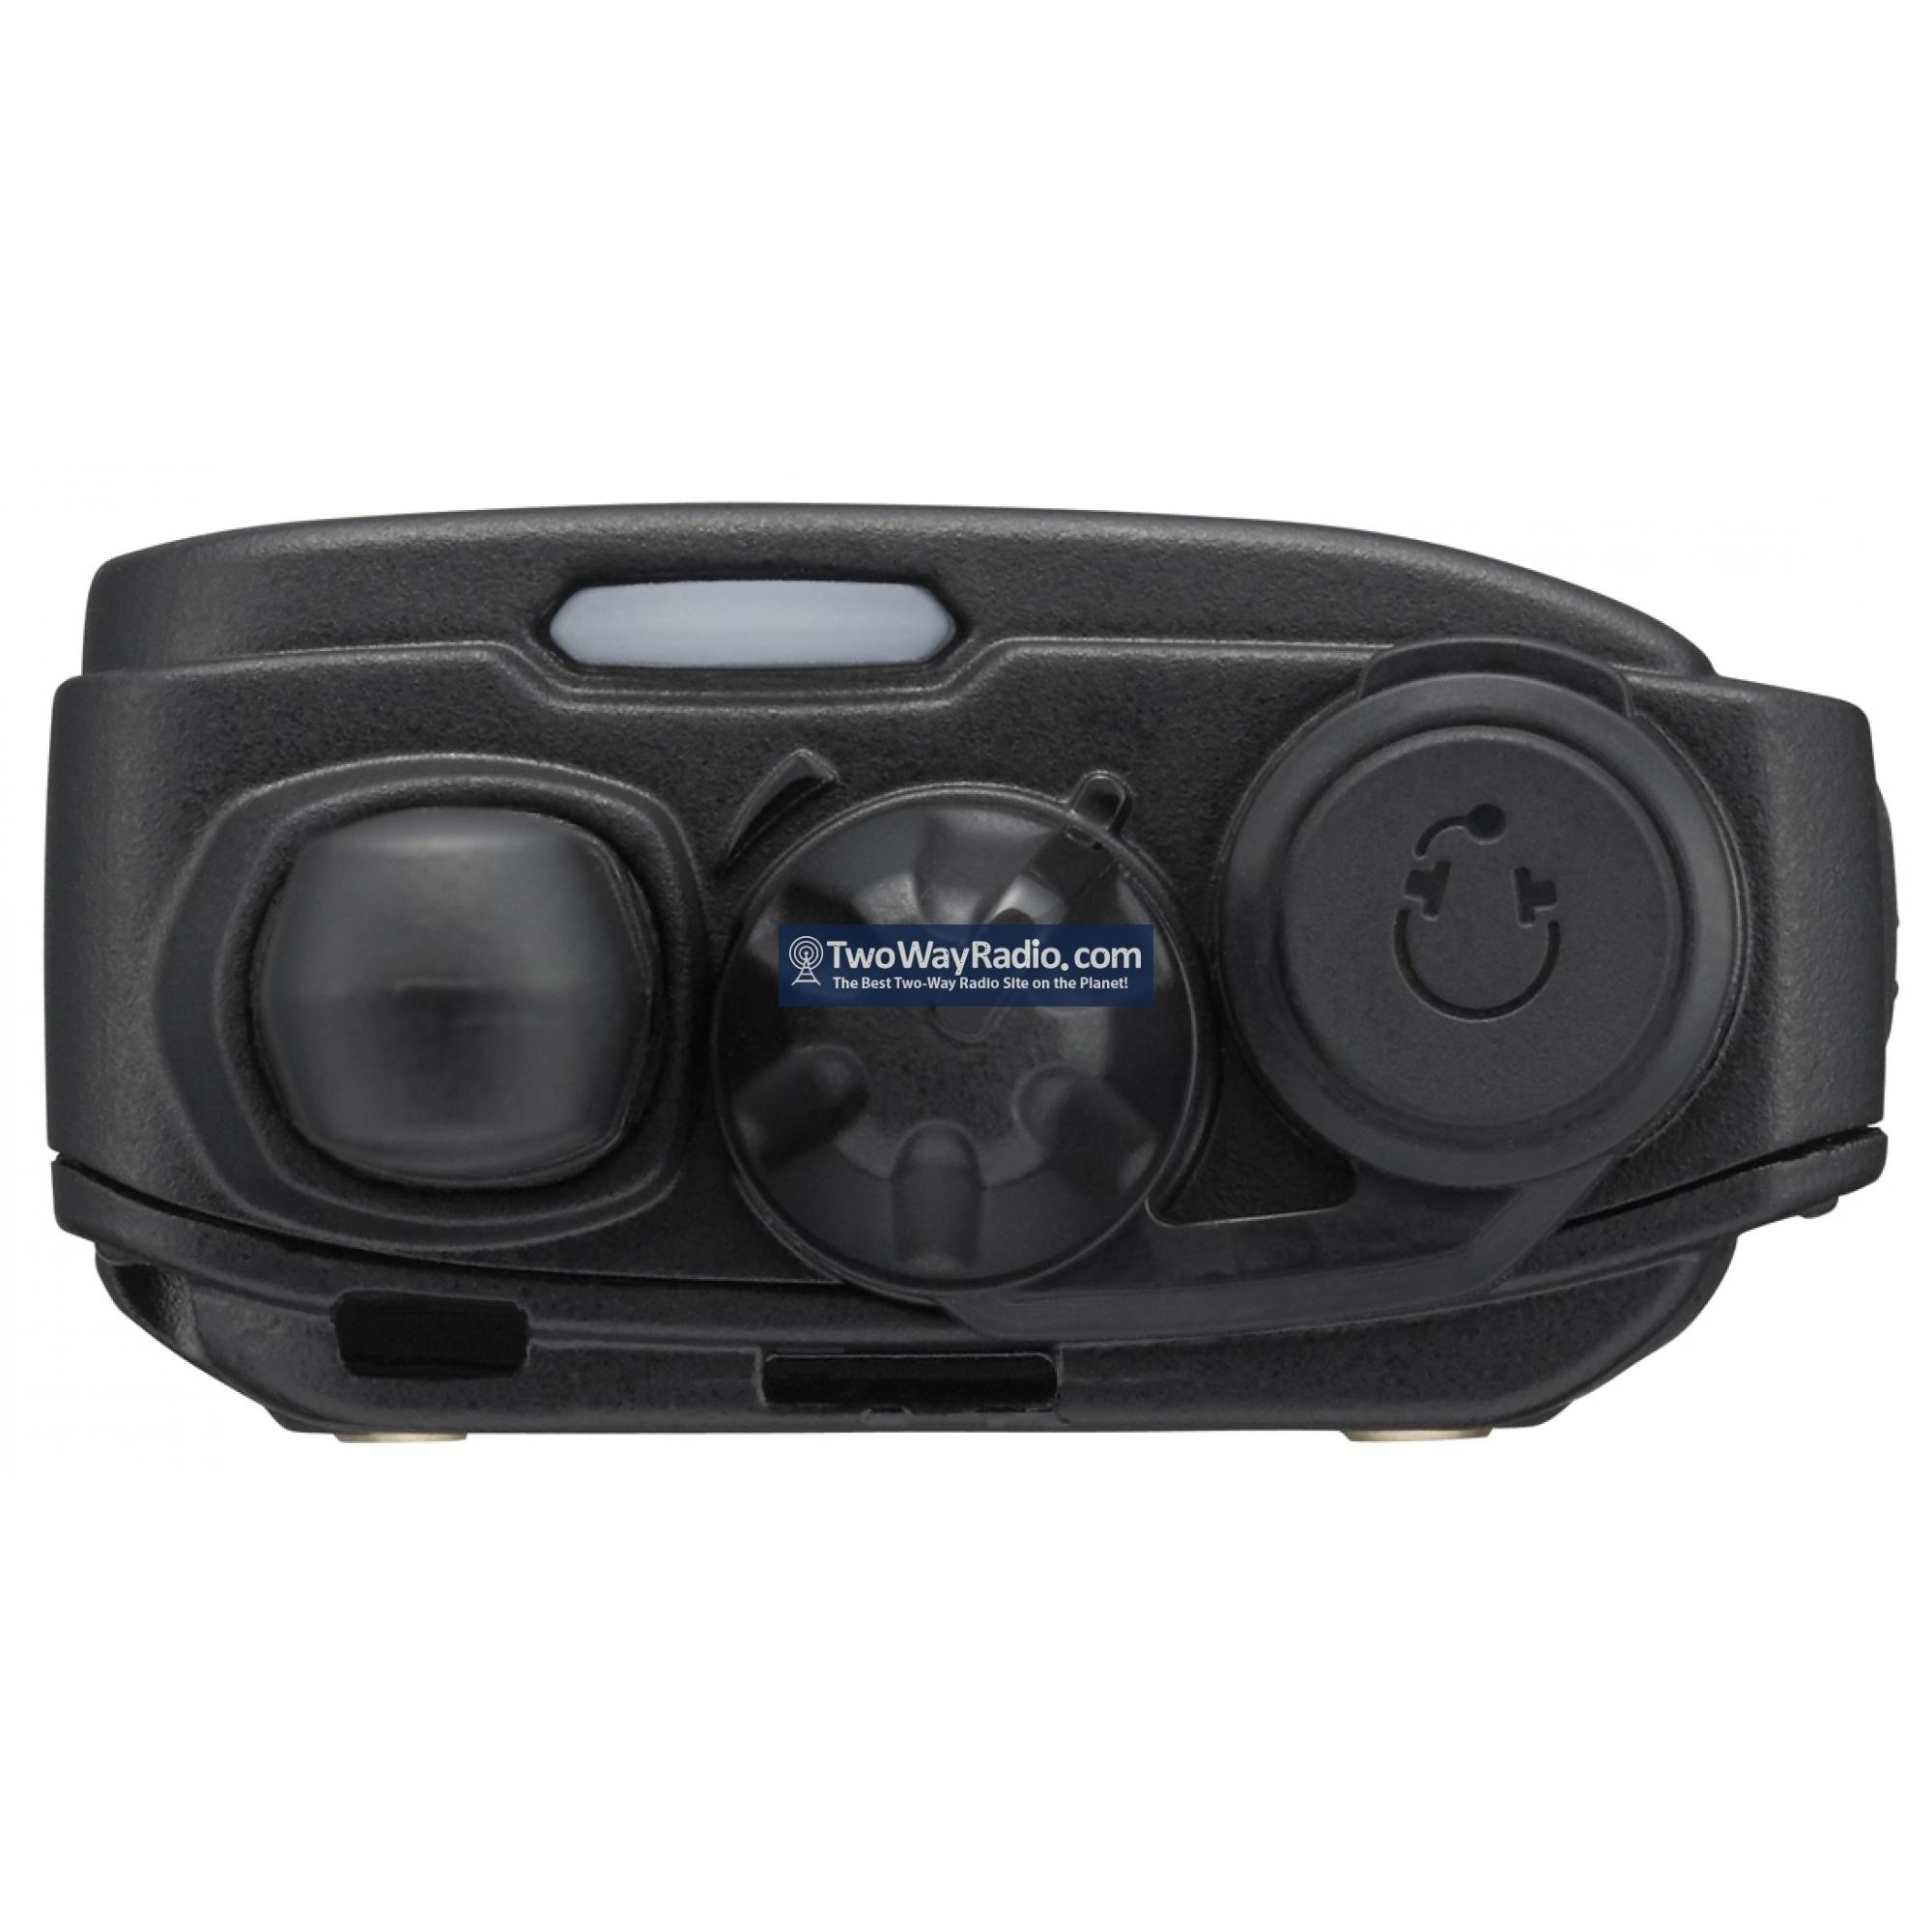 Buy Here | Kenwood NX-P500 Two-Way Radio, 2W, 16C, IP67, UHF